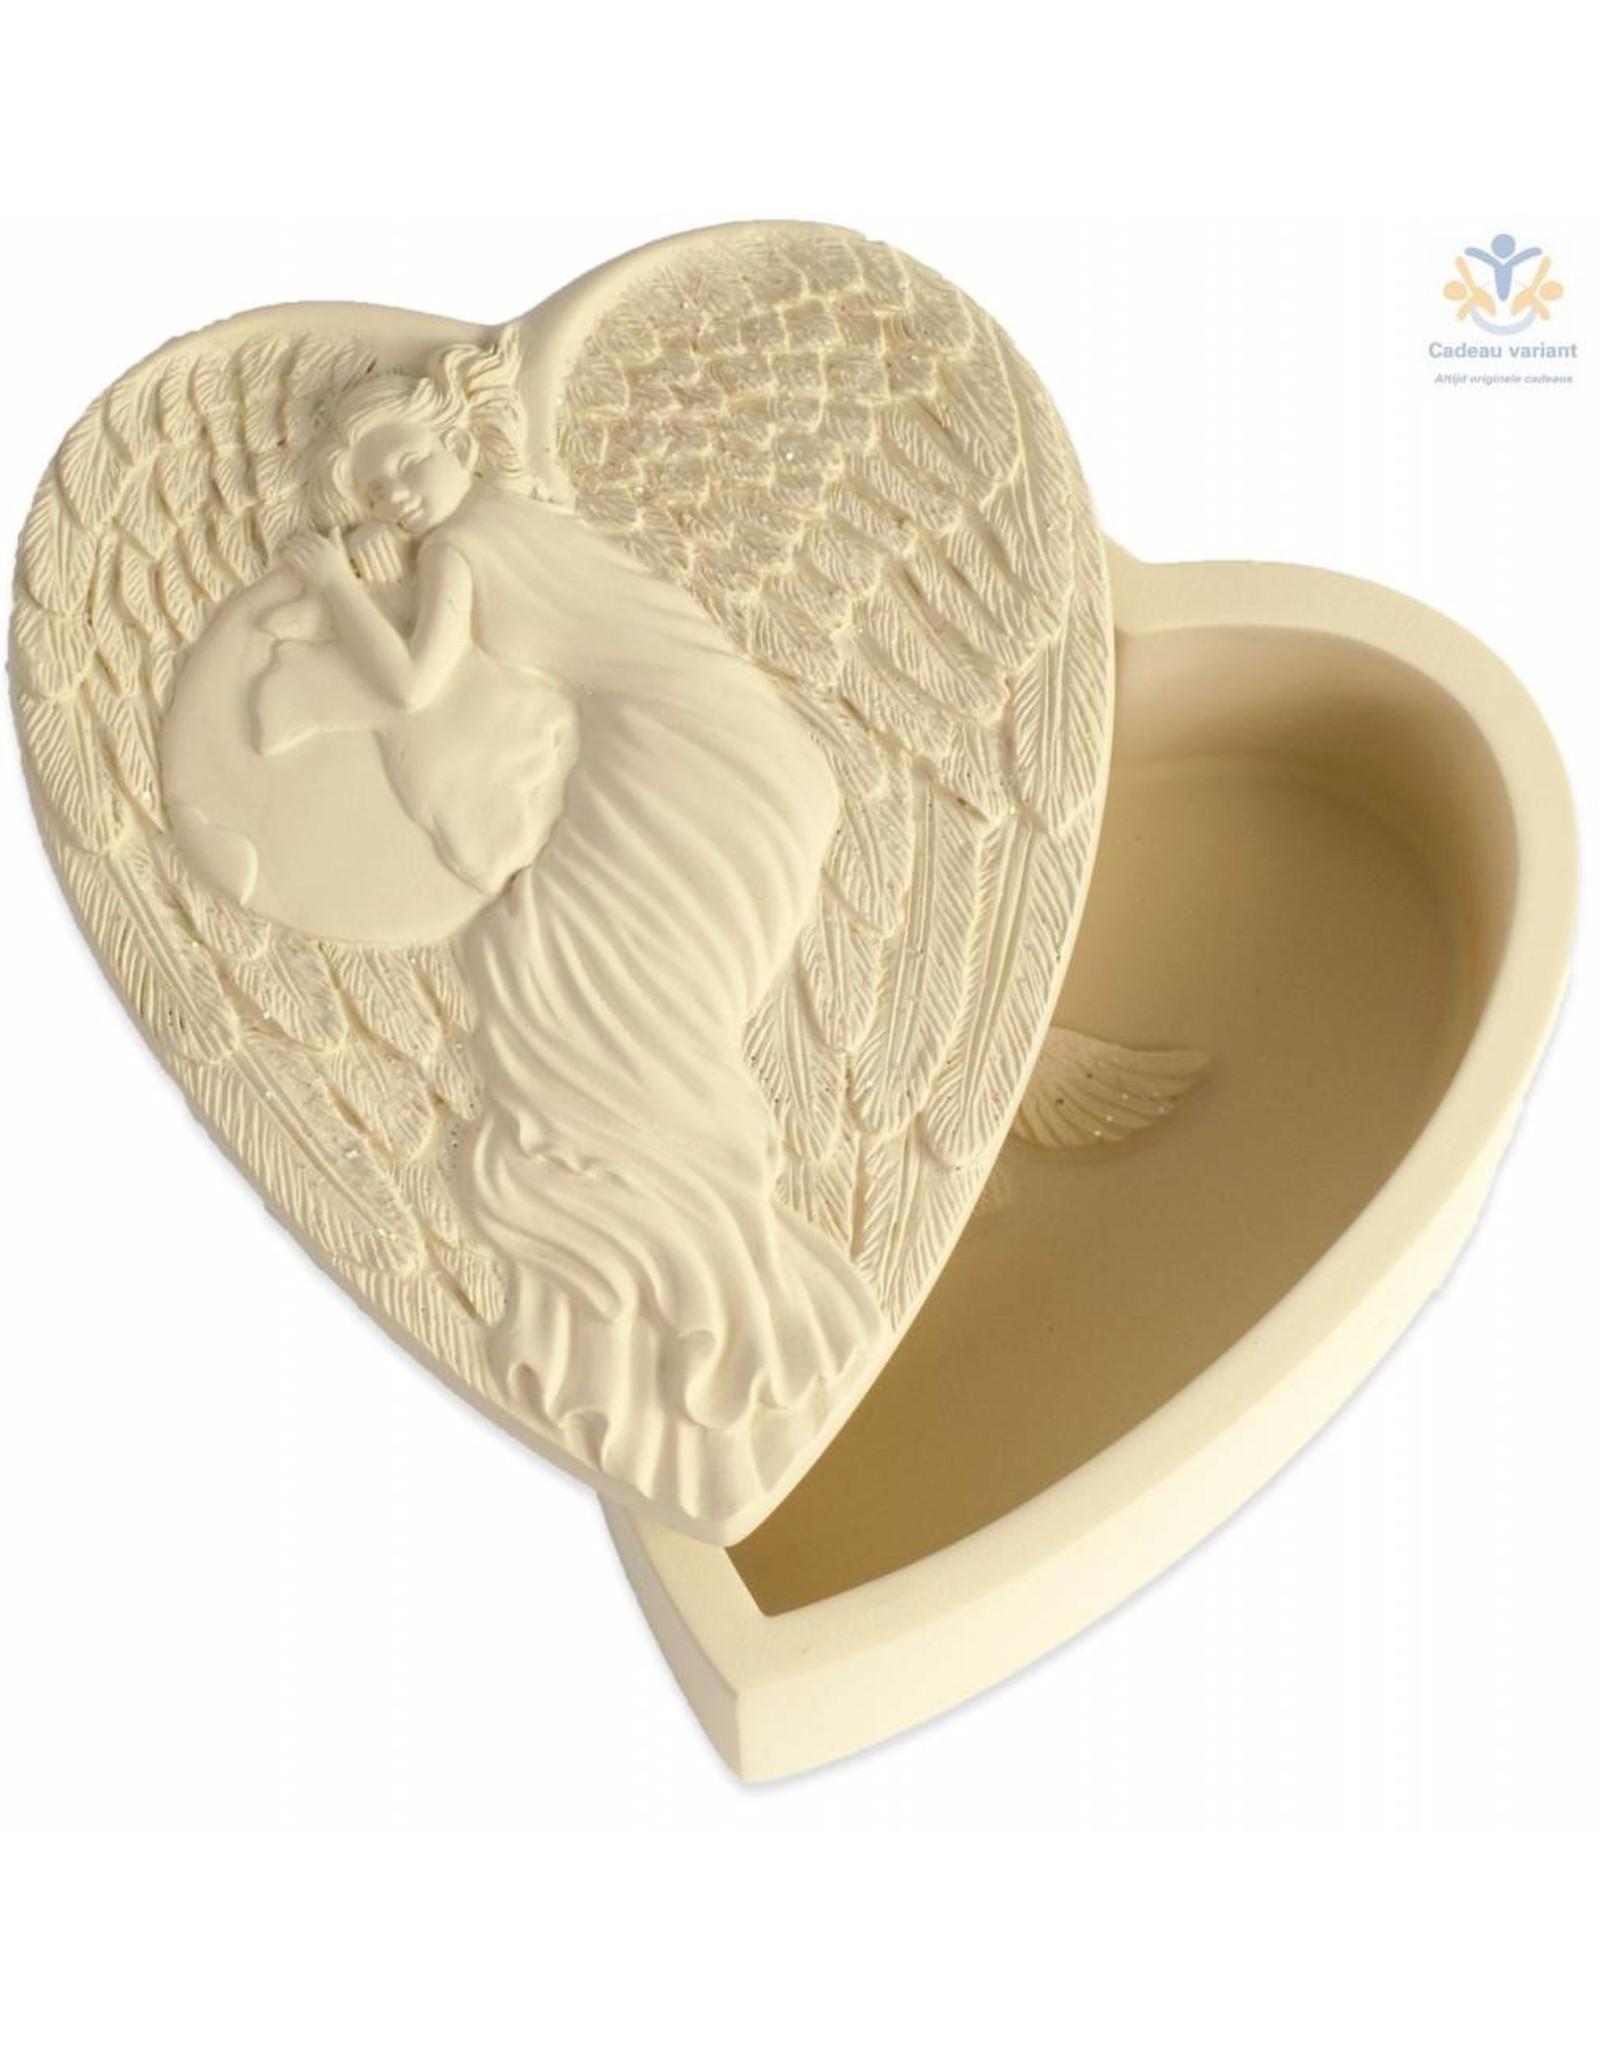 Angelstar Engel hartvormig wensendoosje